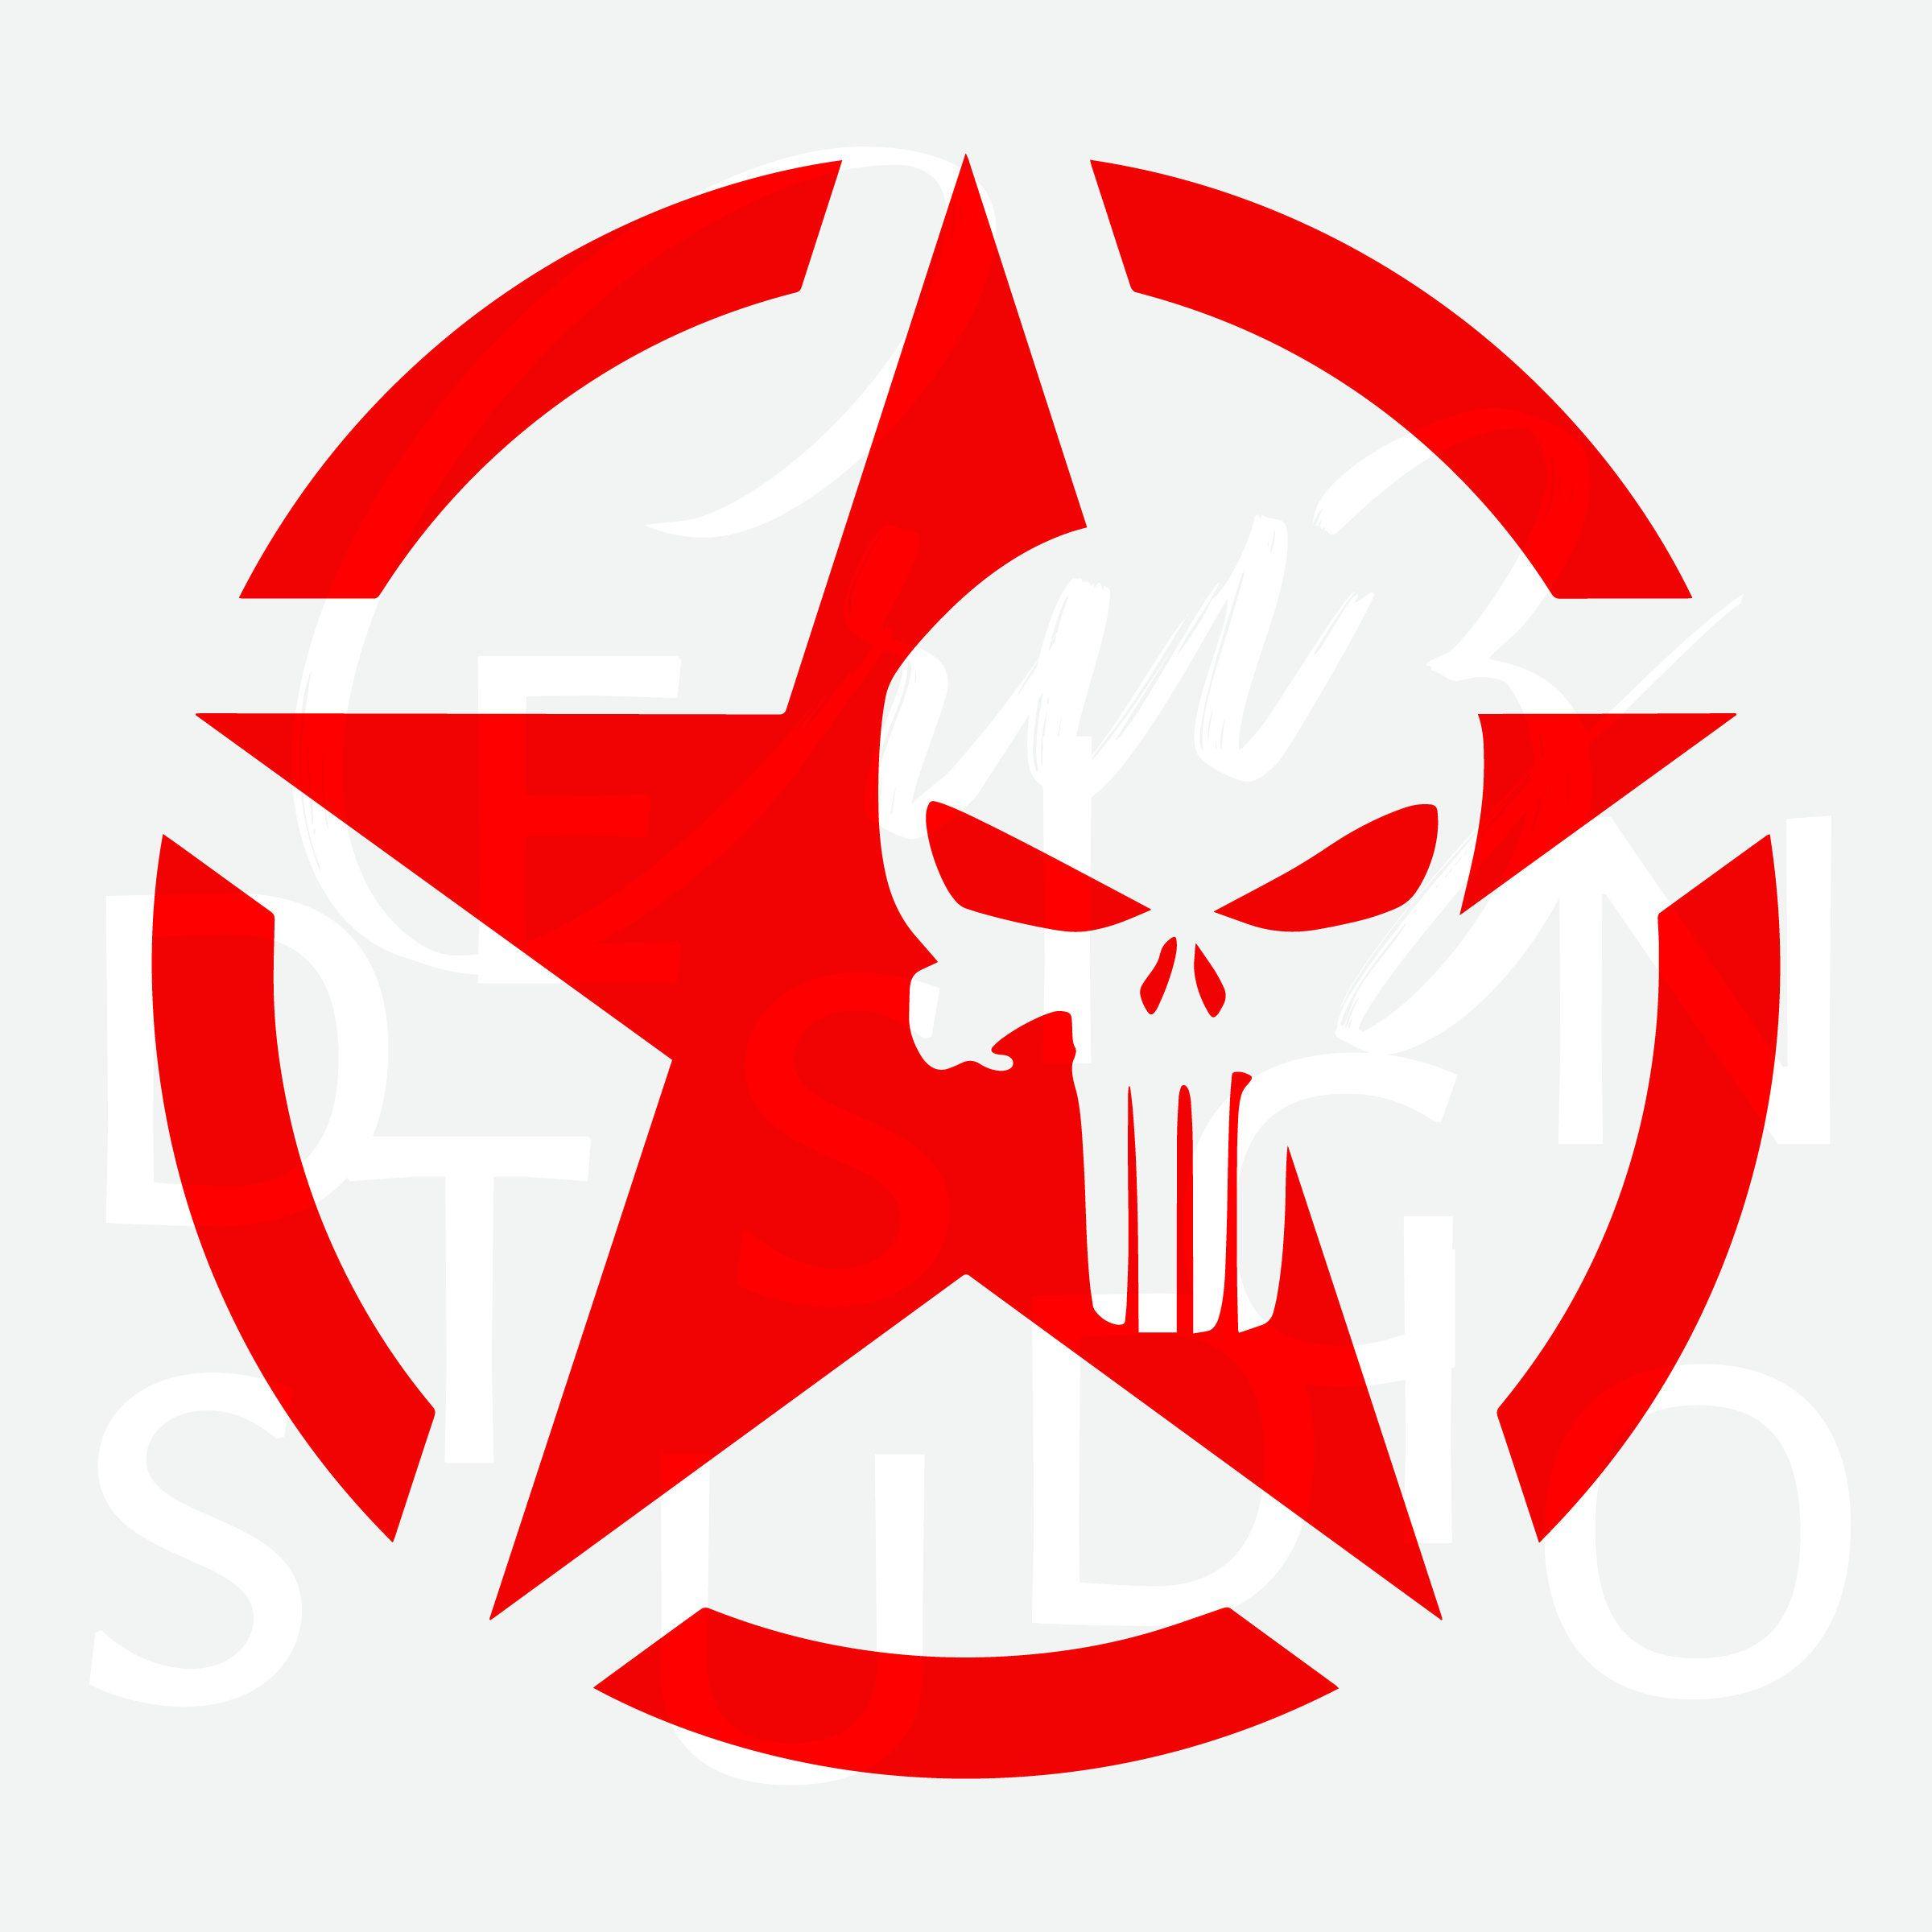 Pin by Alex Cruz on SVG Star svg, Jeep star, Punisher